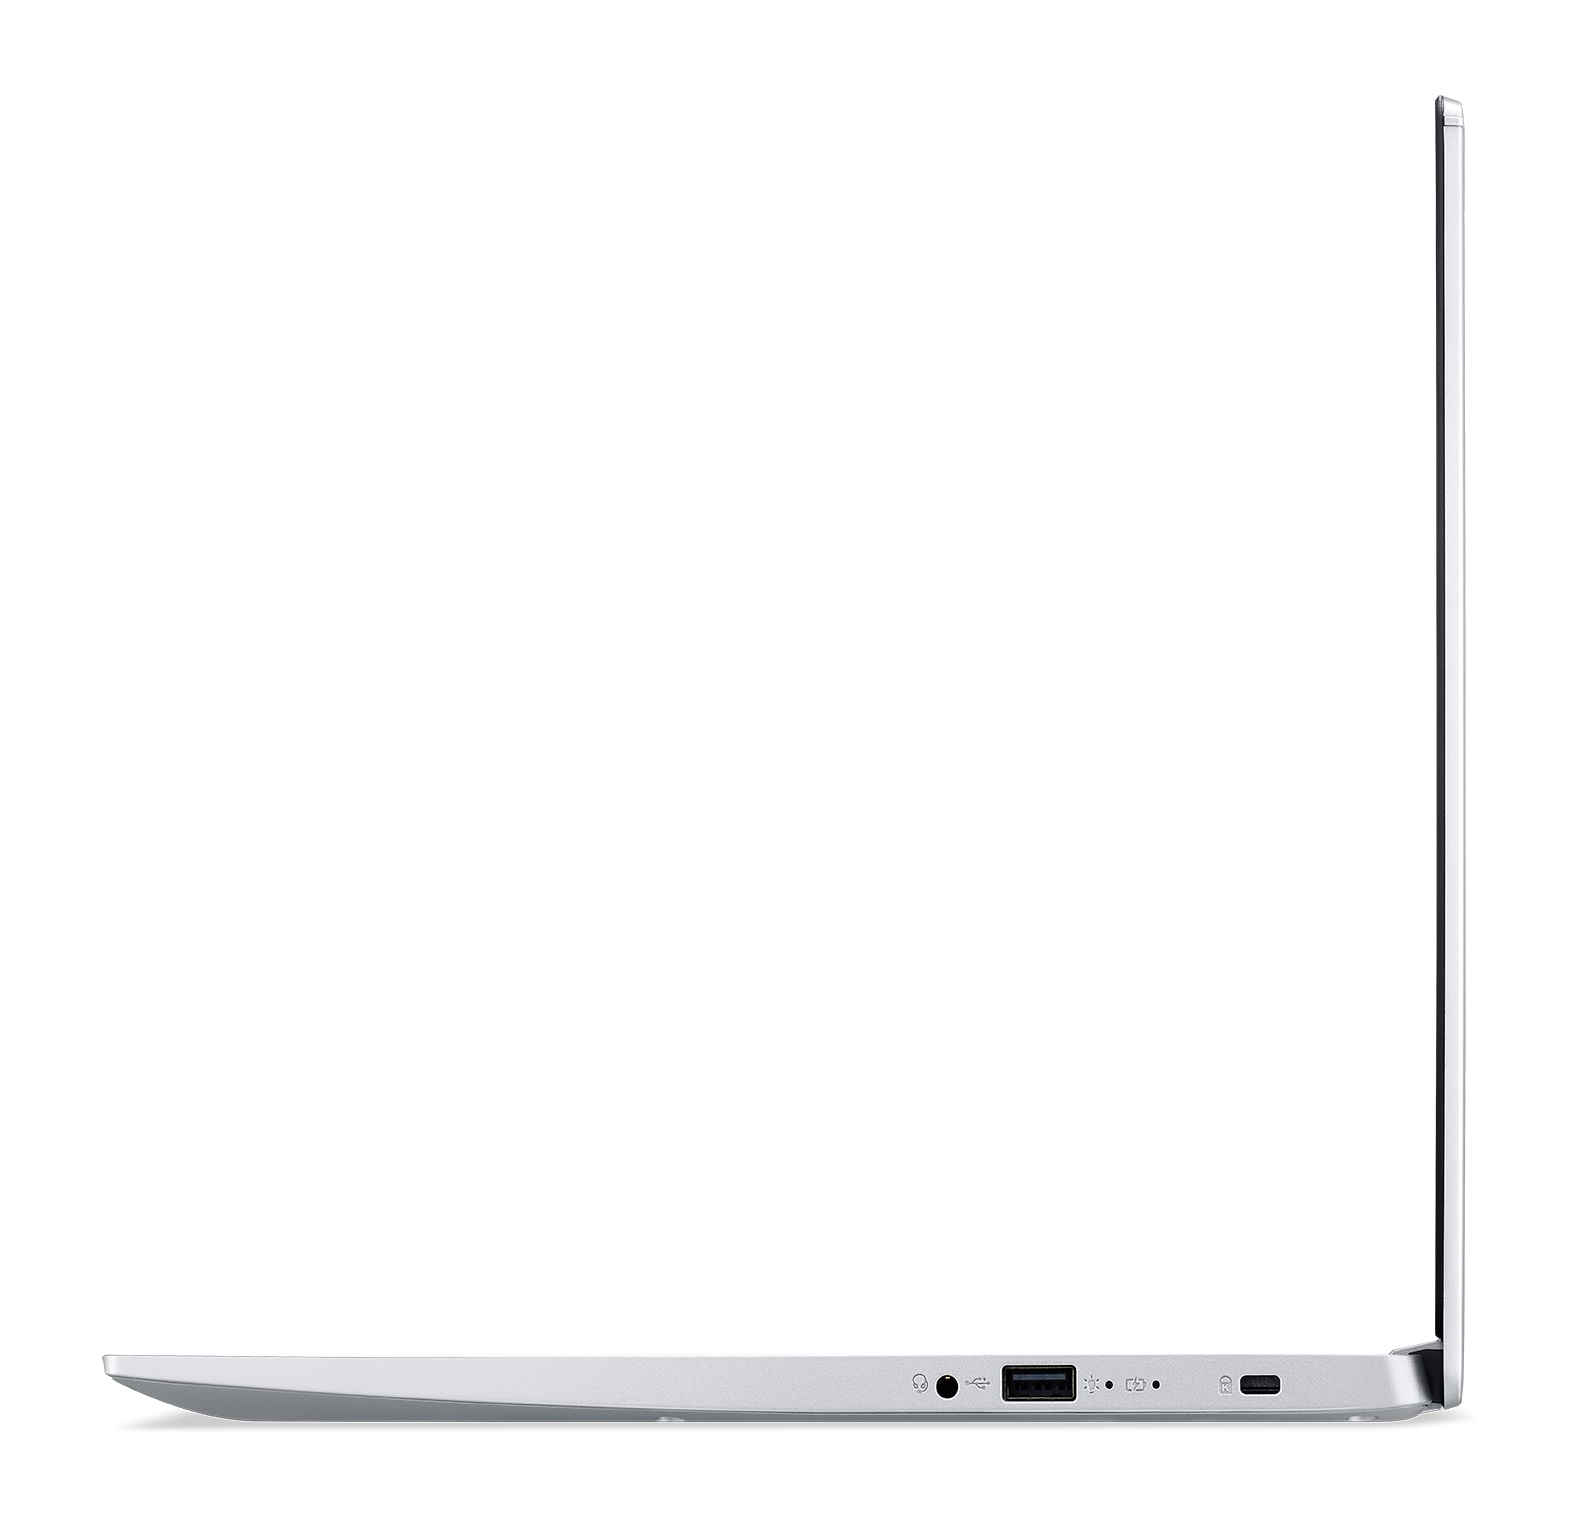 "Laptop 15.6"" ACER Aspire A515-45 (NX.A82EU.003) / AMD Ryzen 3 / 8GB / 512GB SSD / Pure Silver"